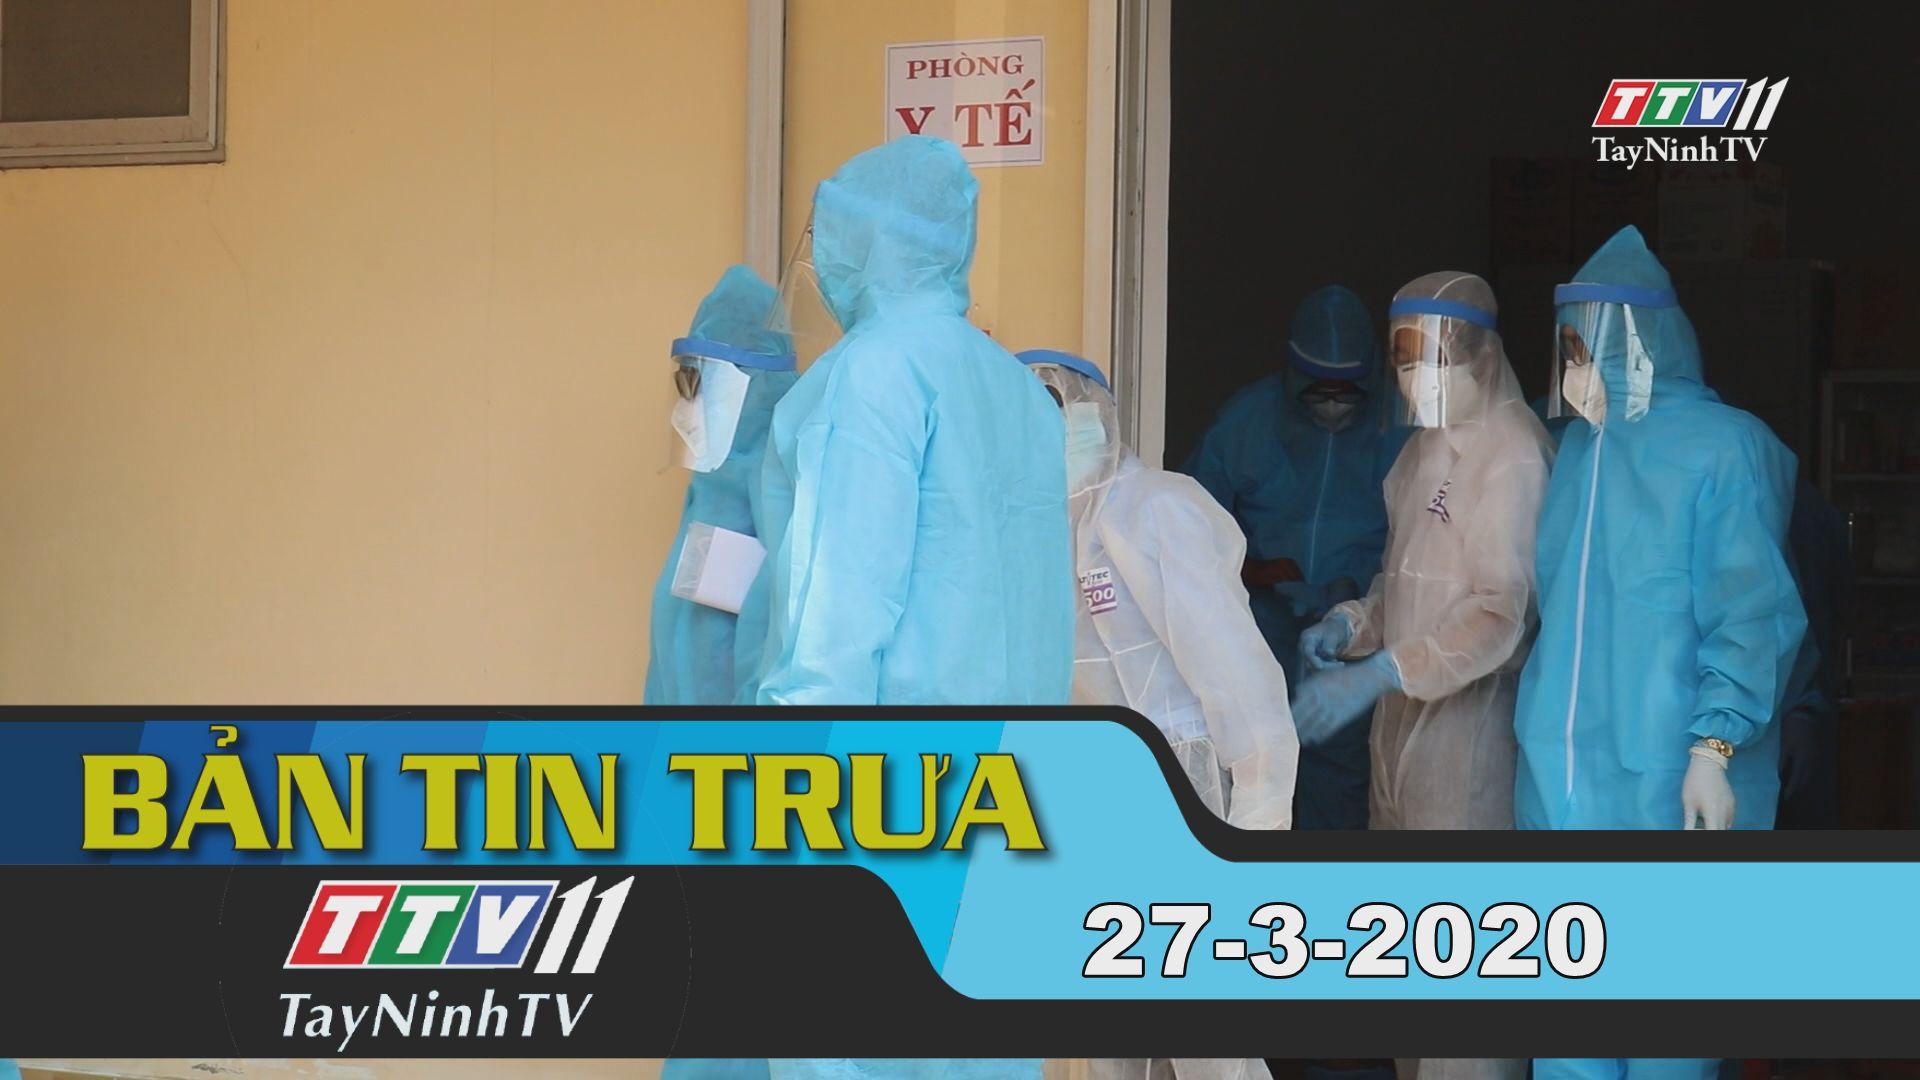 Bản tin trưa 27-3-2020 | Tin tức hôm nay | TayNinhTV